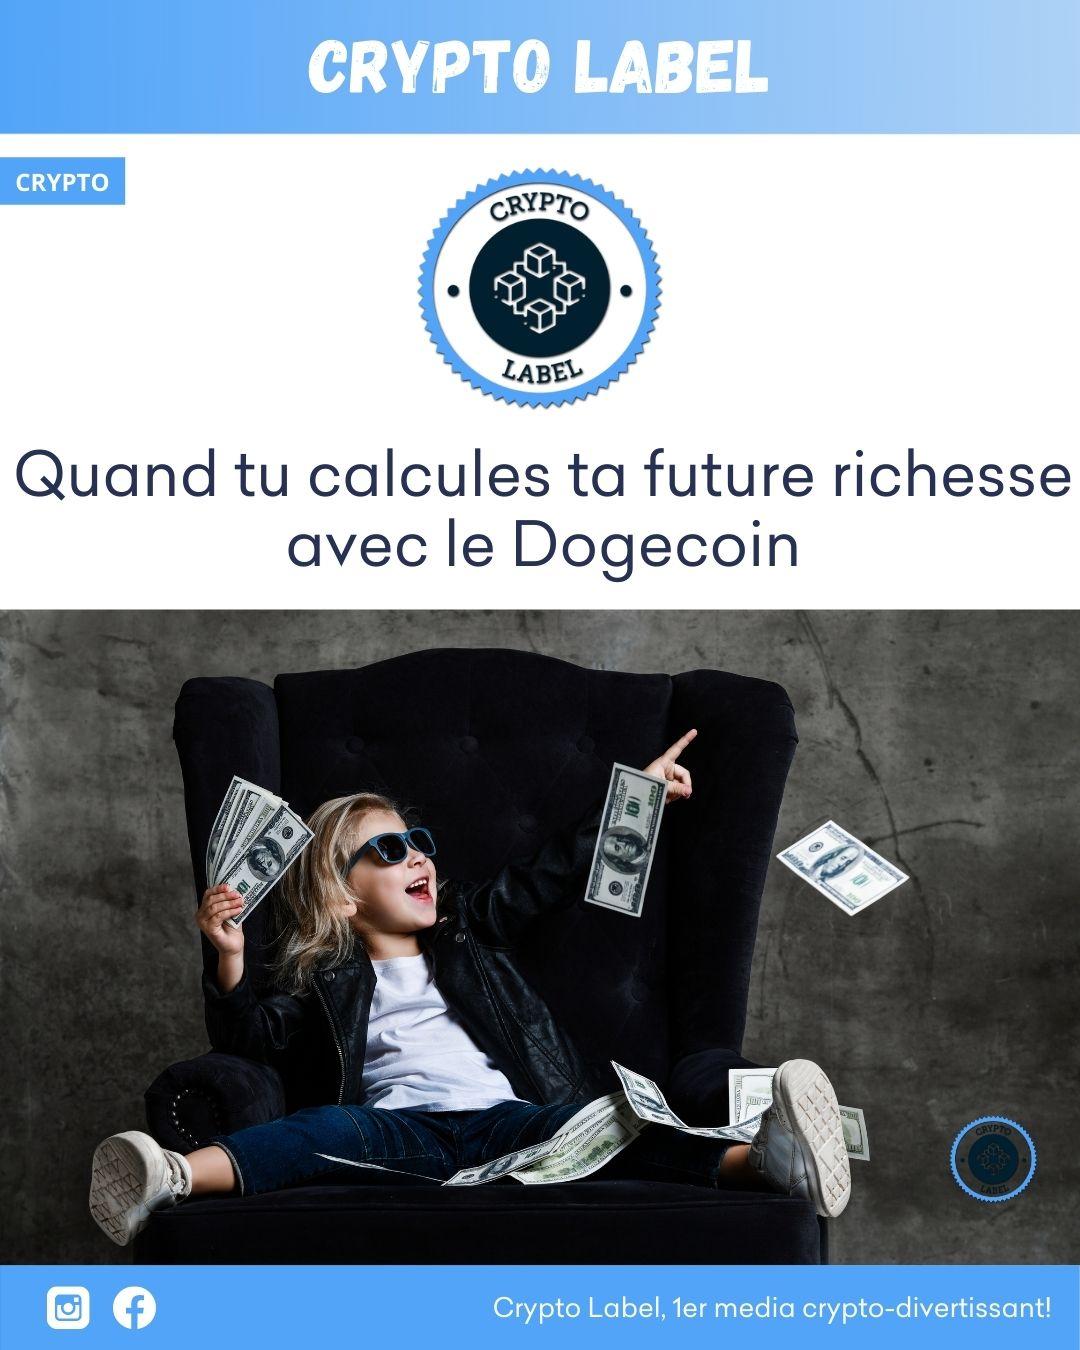 MEME future-richesse-doge-crypto-label (1)